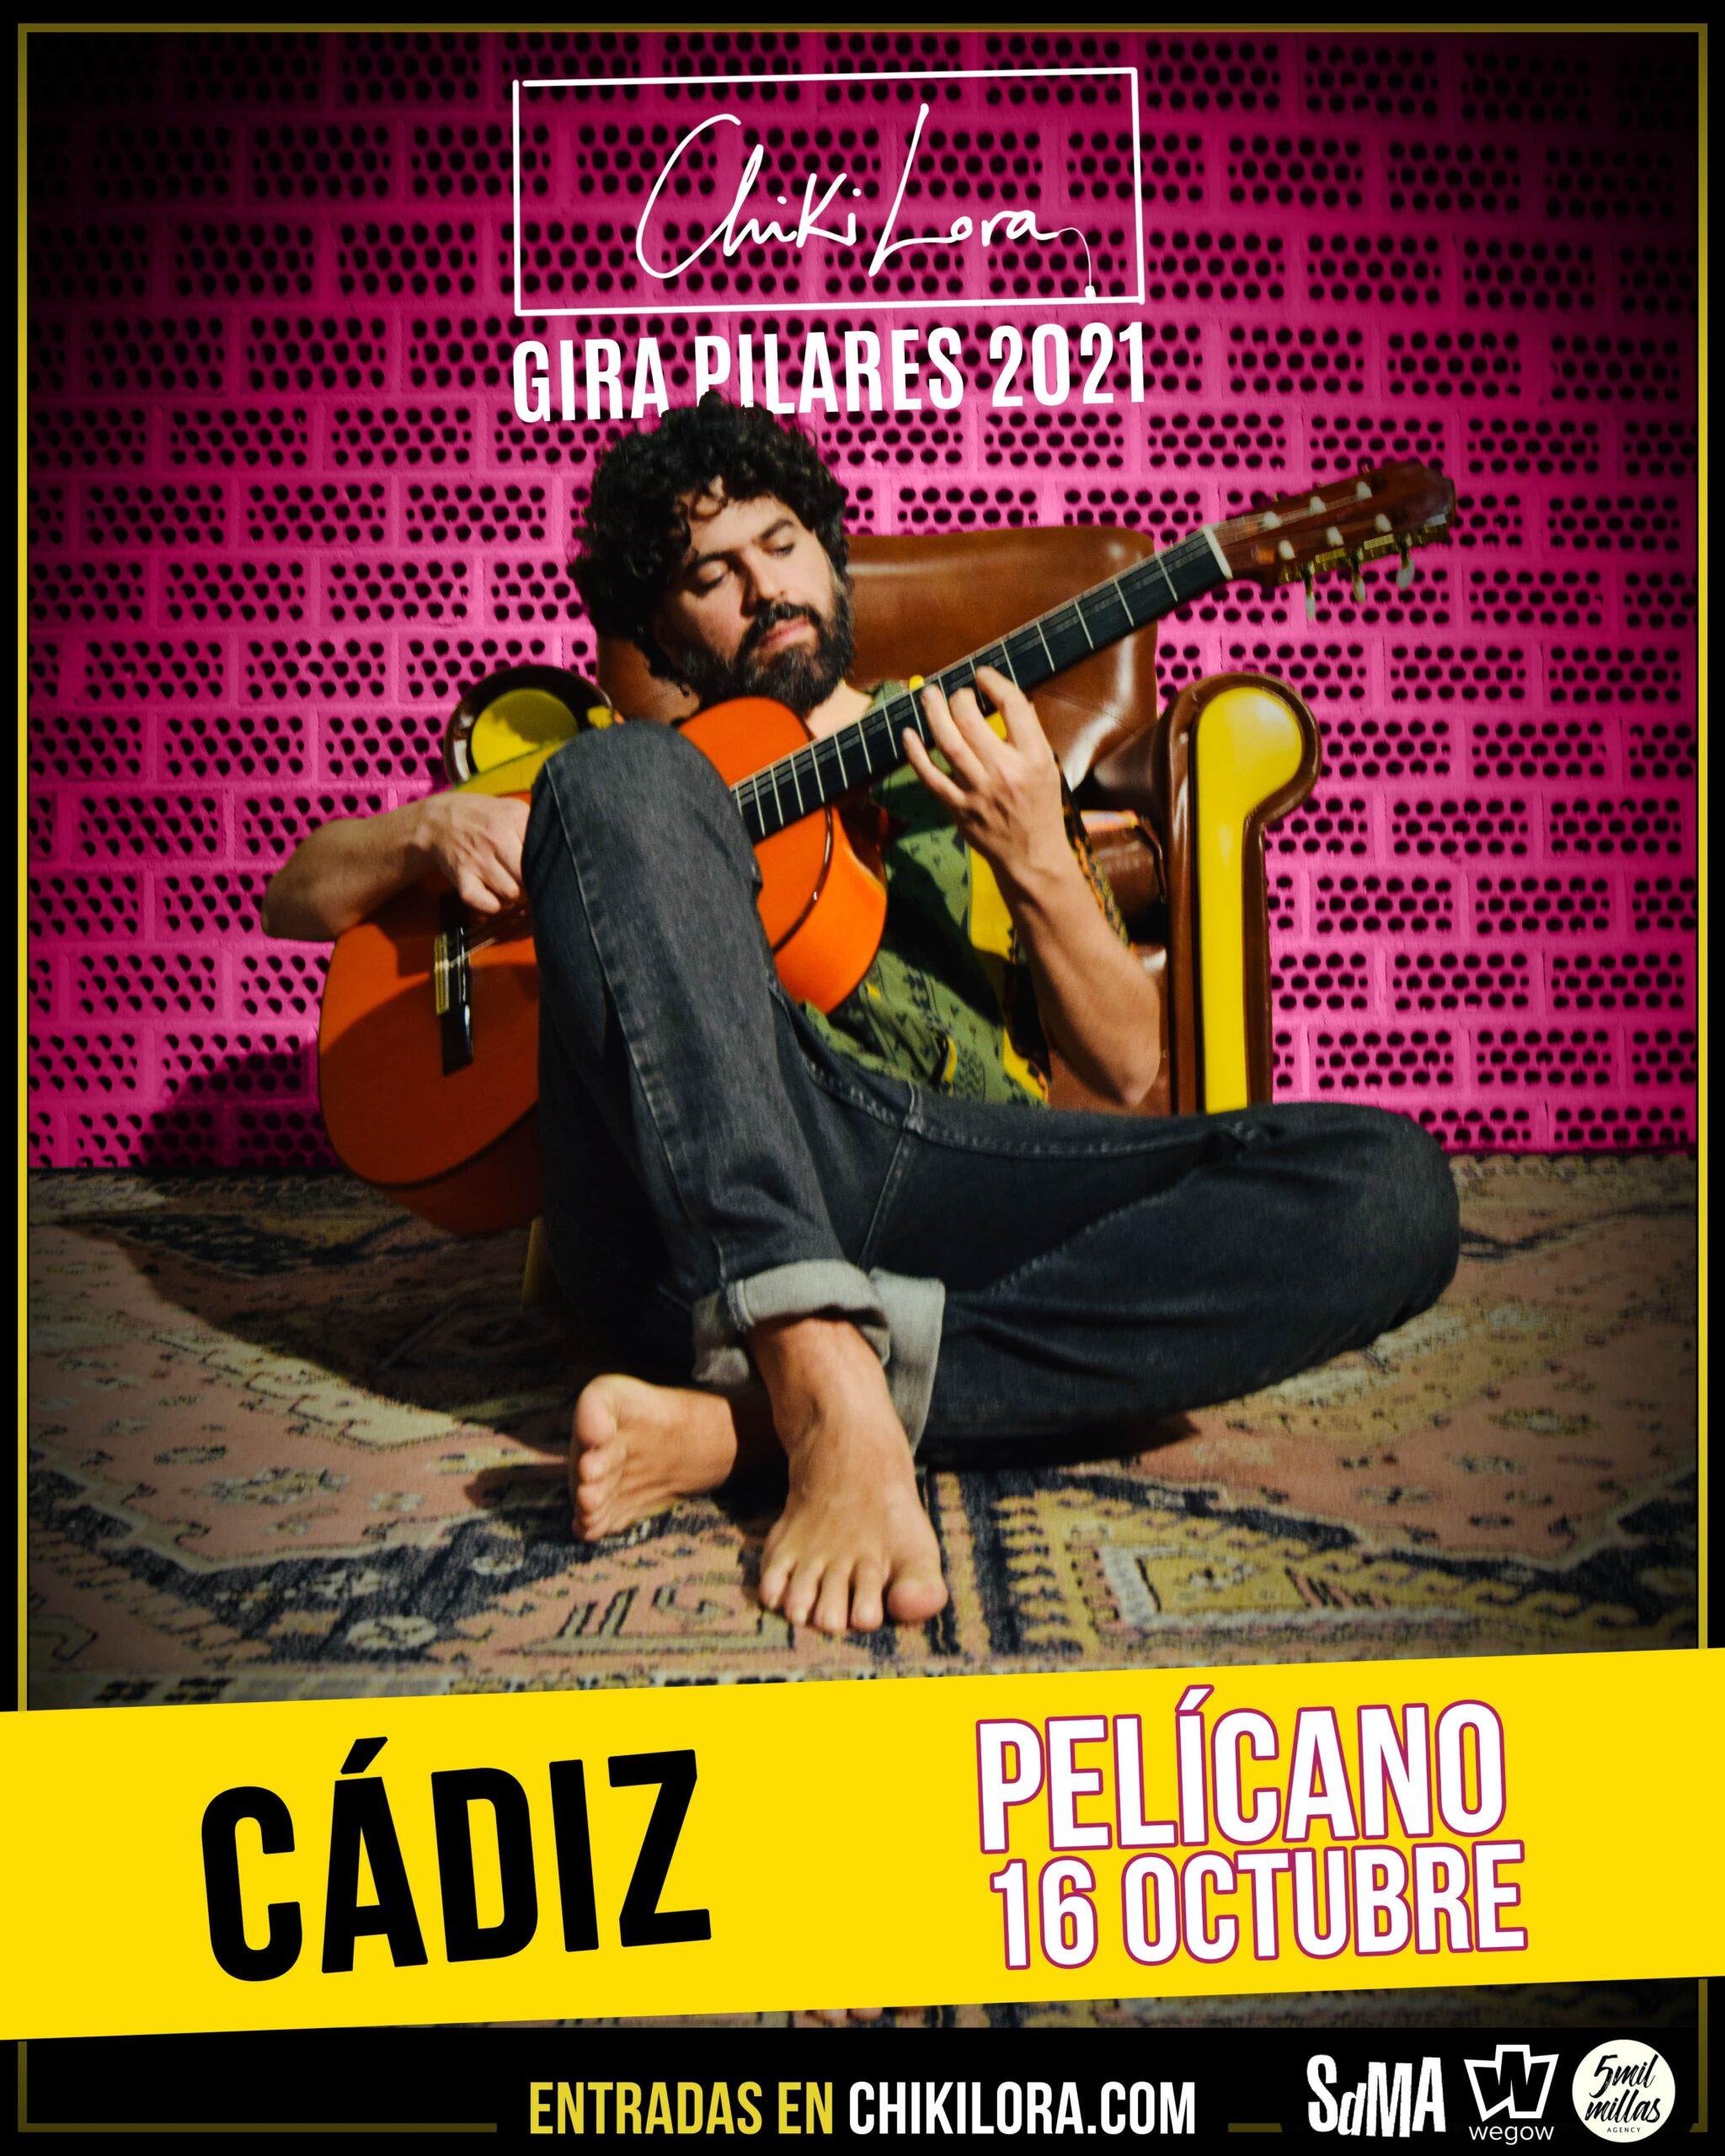 concierto de chiki lora cadiz 16304029904092395